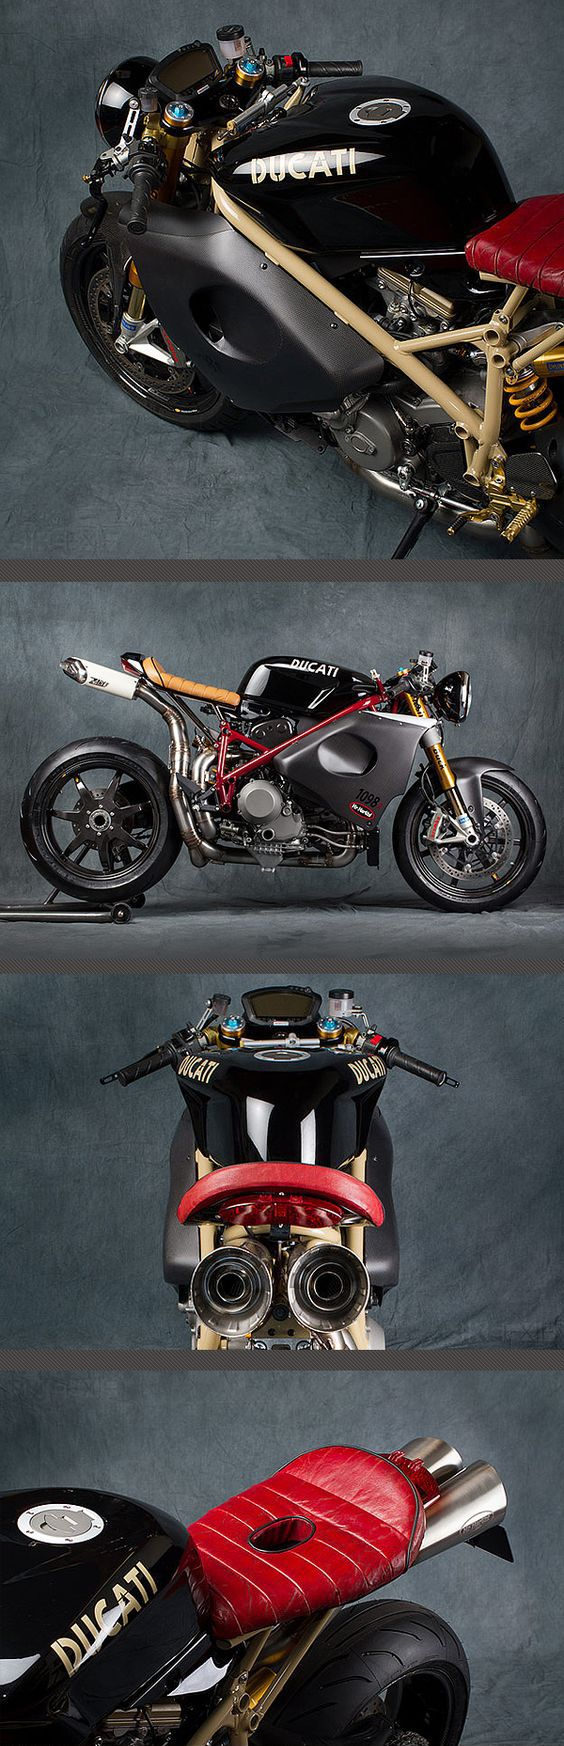 #Ducati 1098R #Moto #Motorcycle #Bike